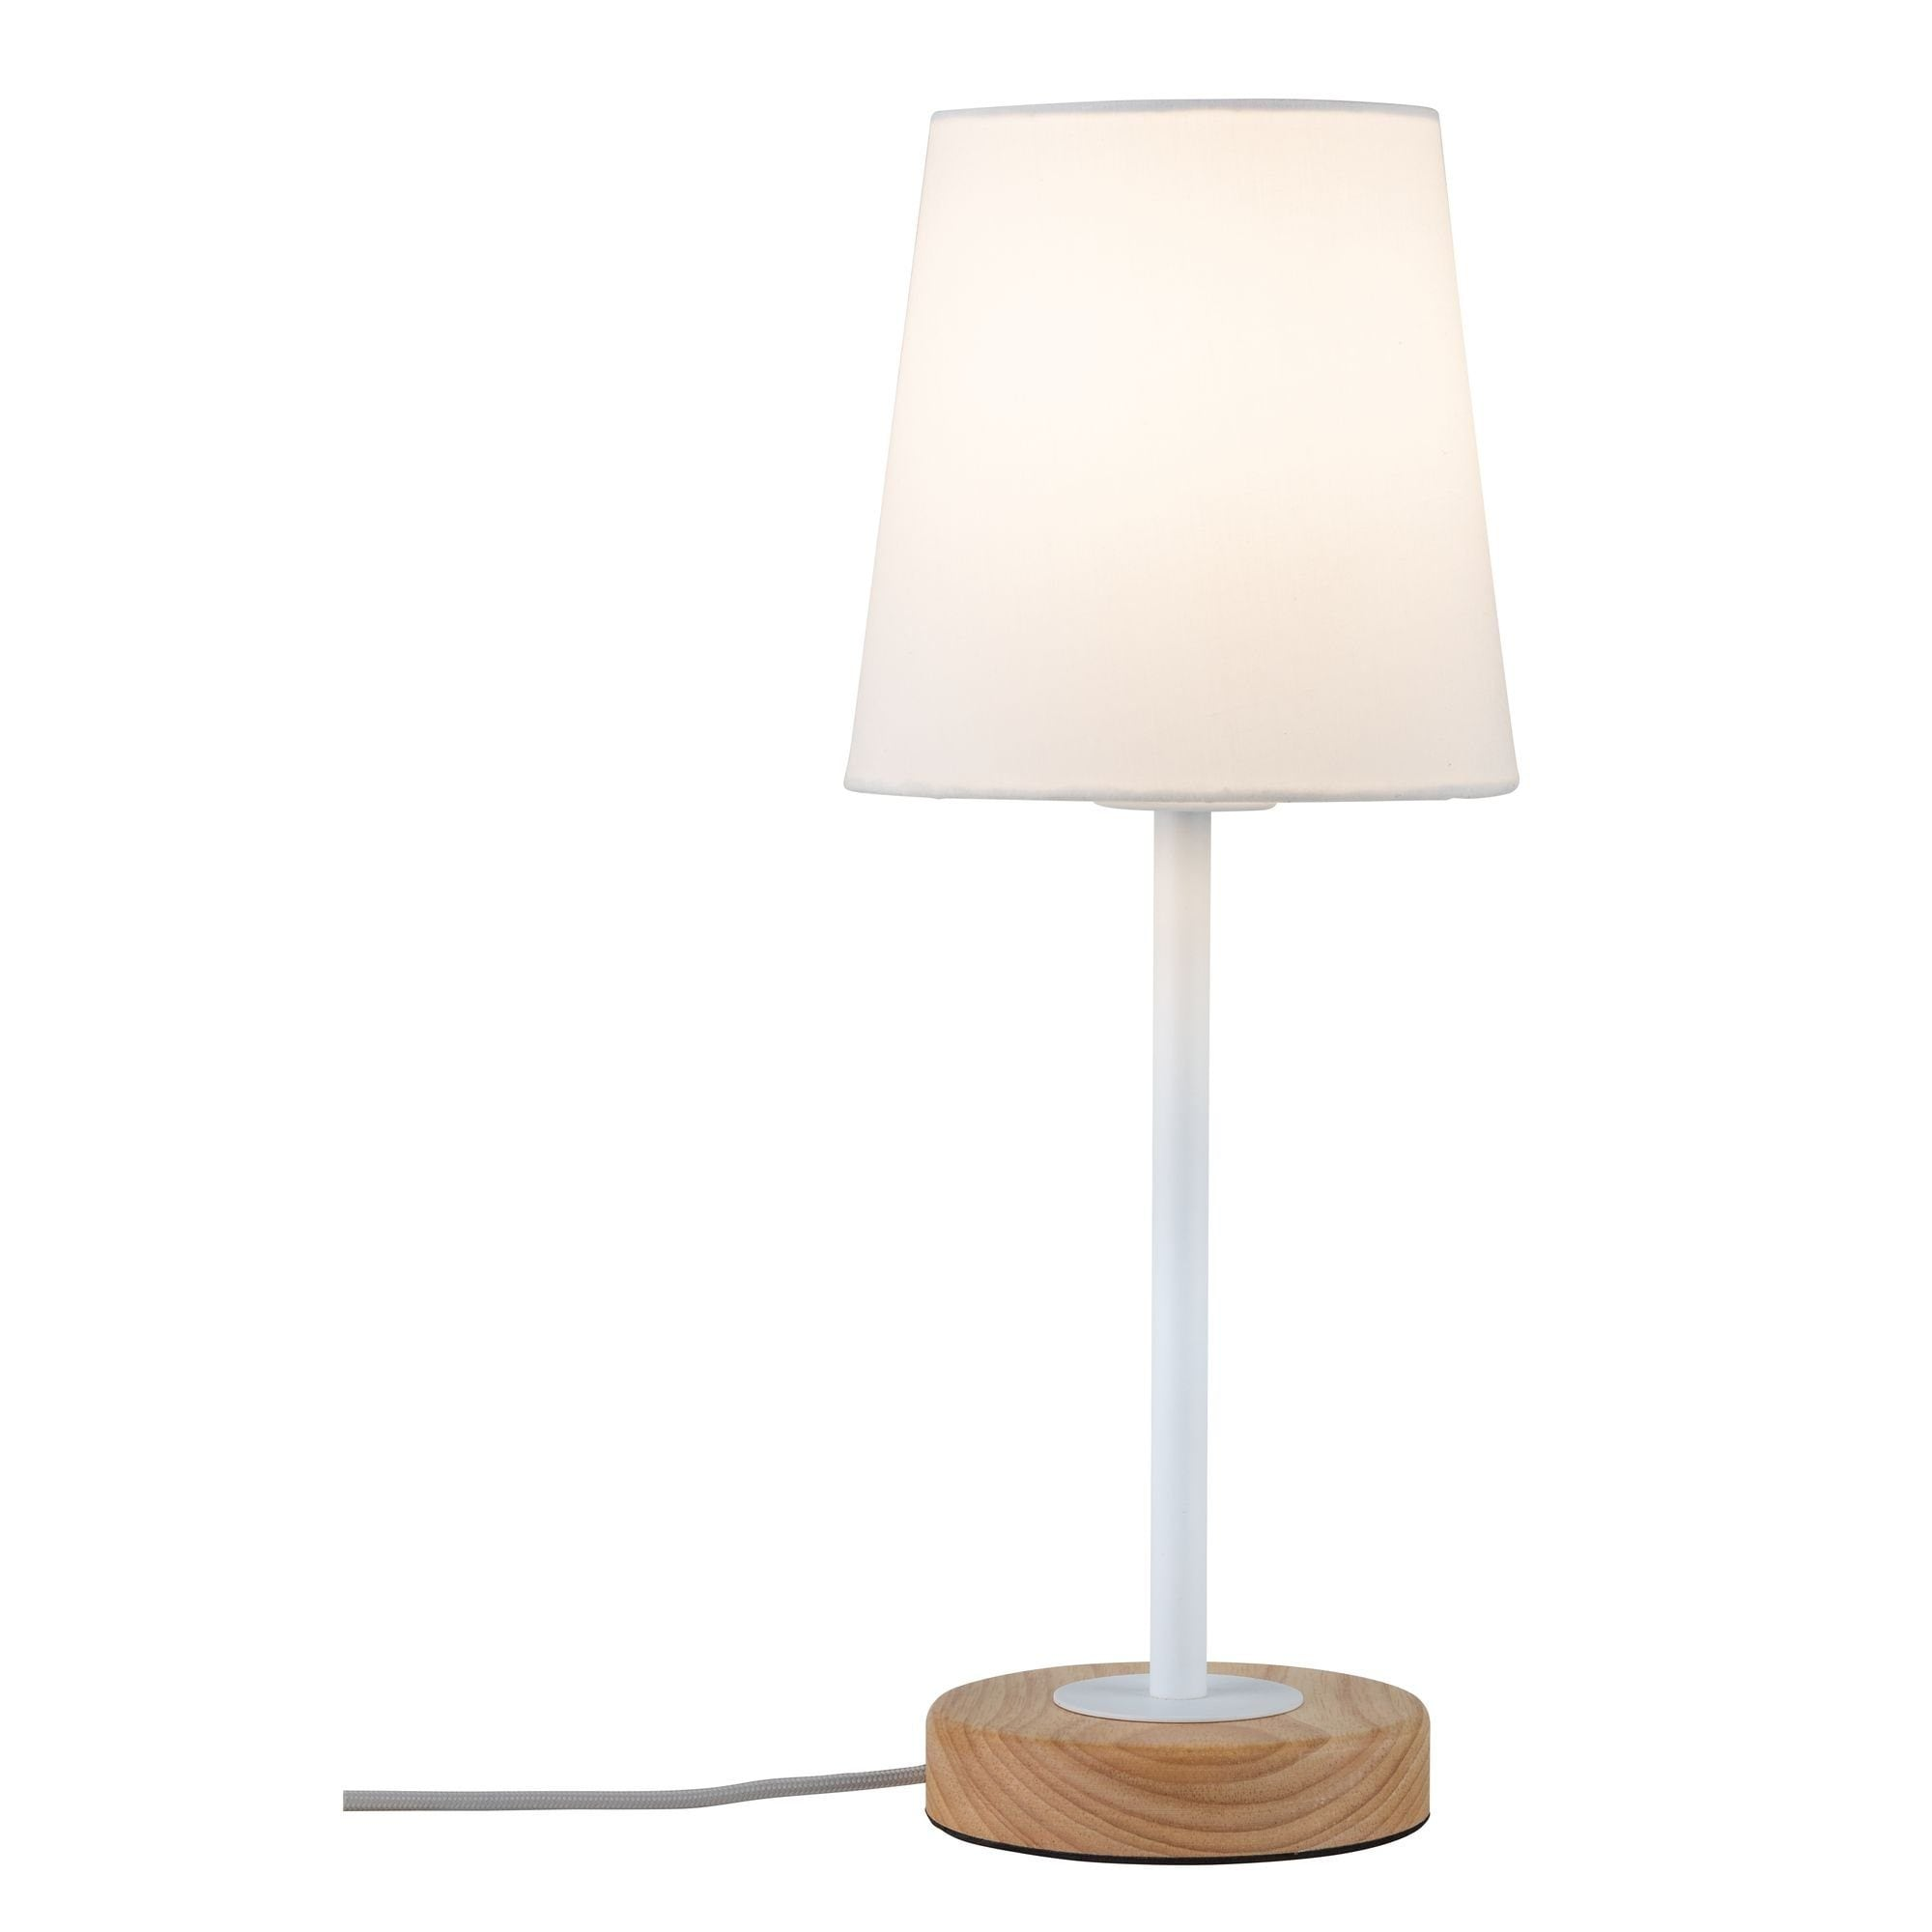 Paulmann LED Tischleuchte Neordic Stellan Weiß/Holz, E27, 1 St.